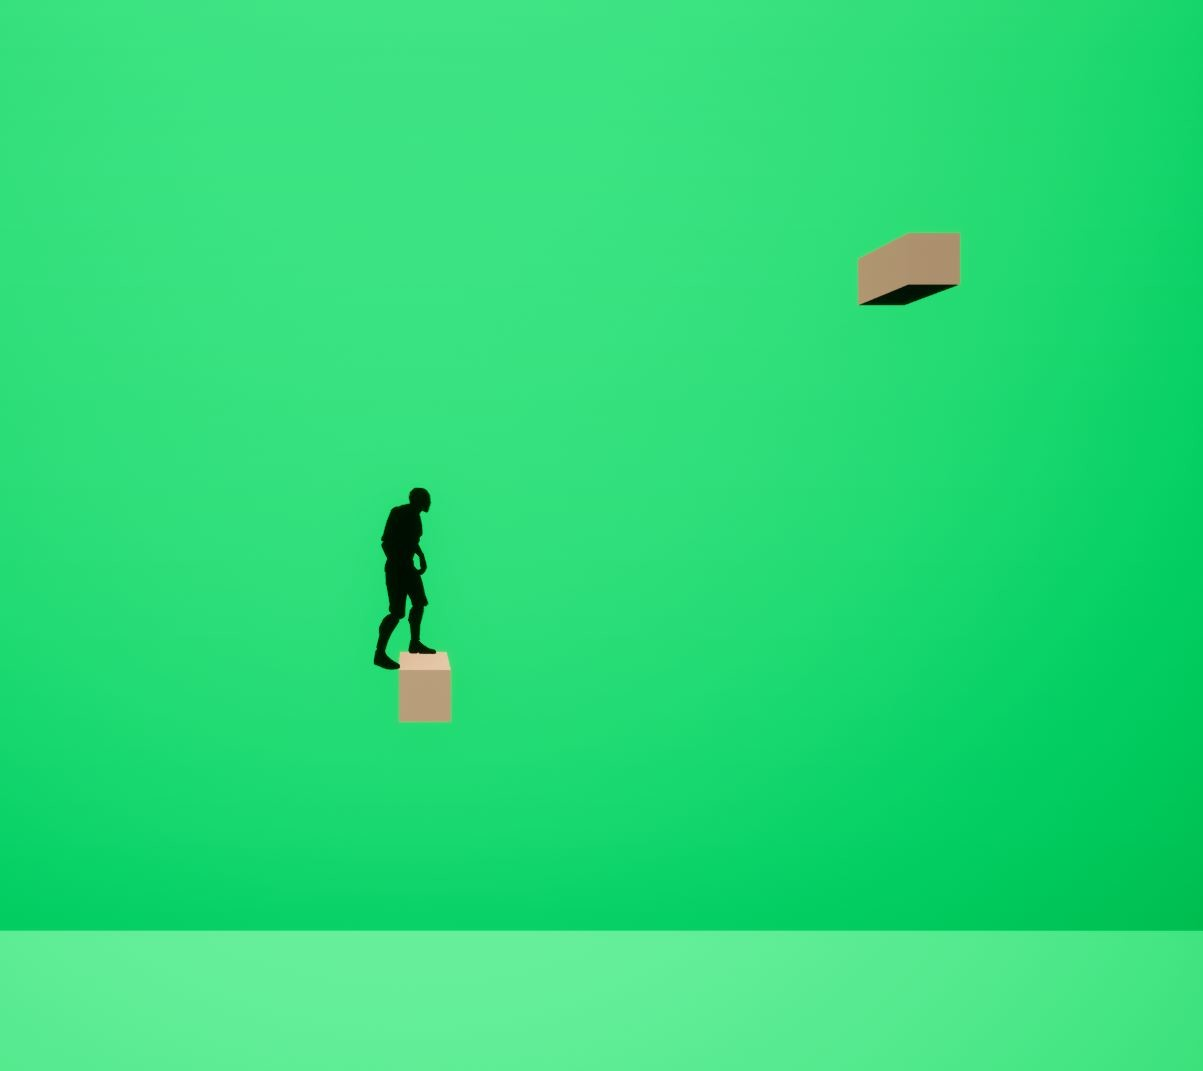 The Running Man screenshot